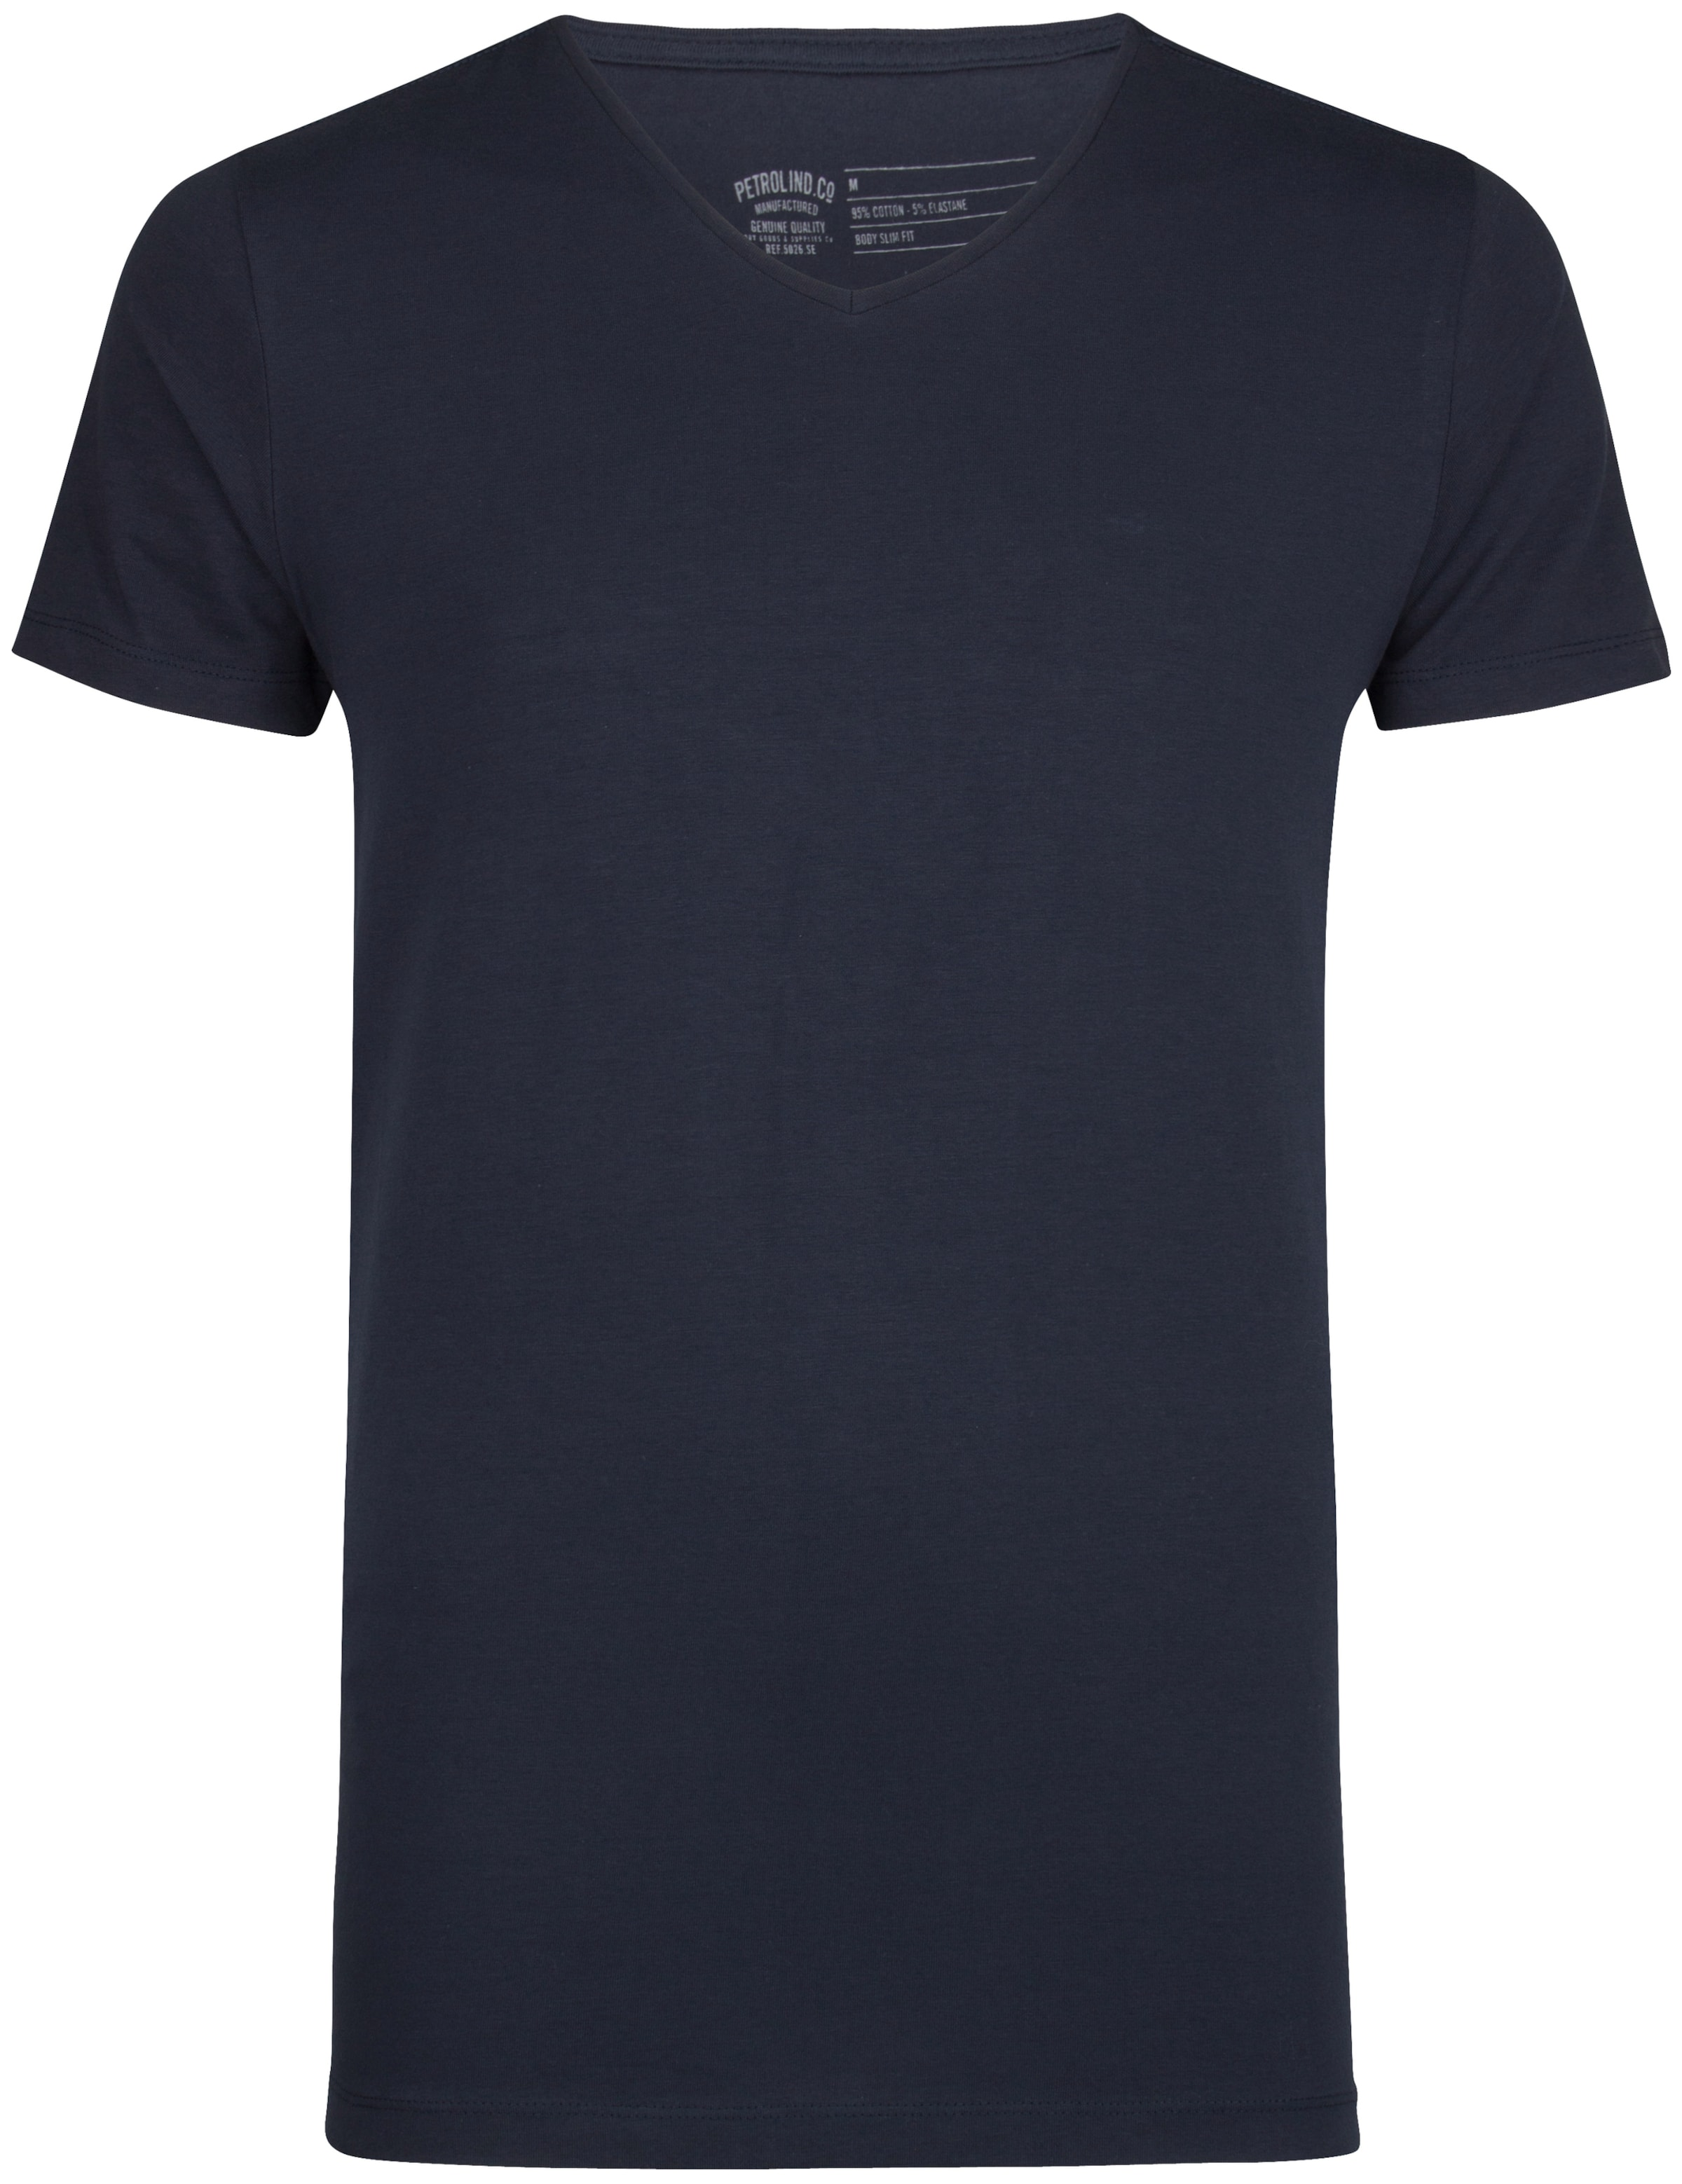 Petrol Industries 2er-Pack T-Shirts Billig Verkauf Wahl ZH5Crauw1